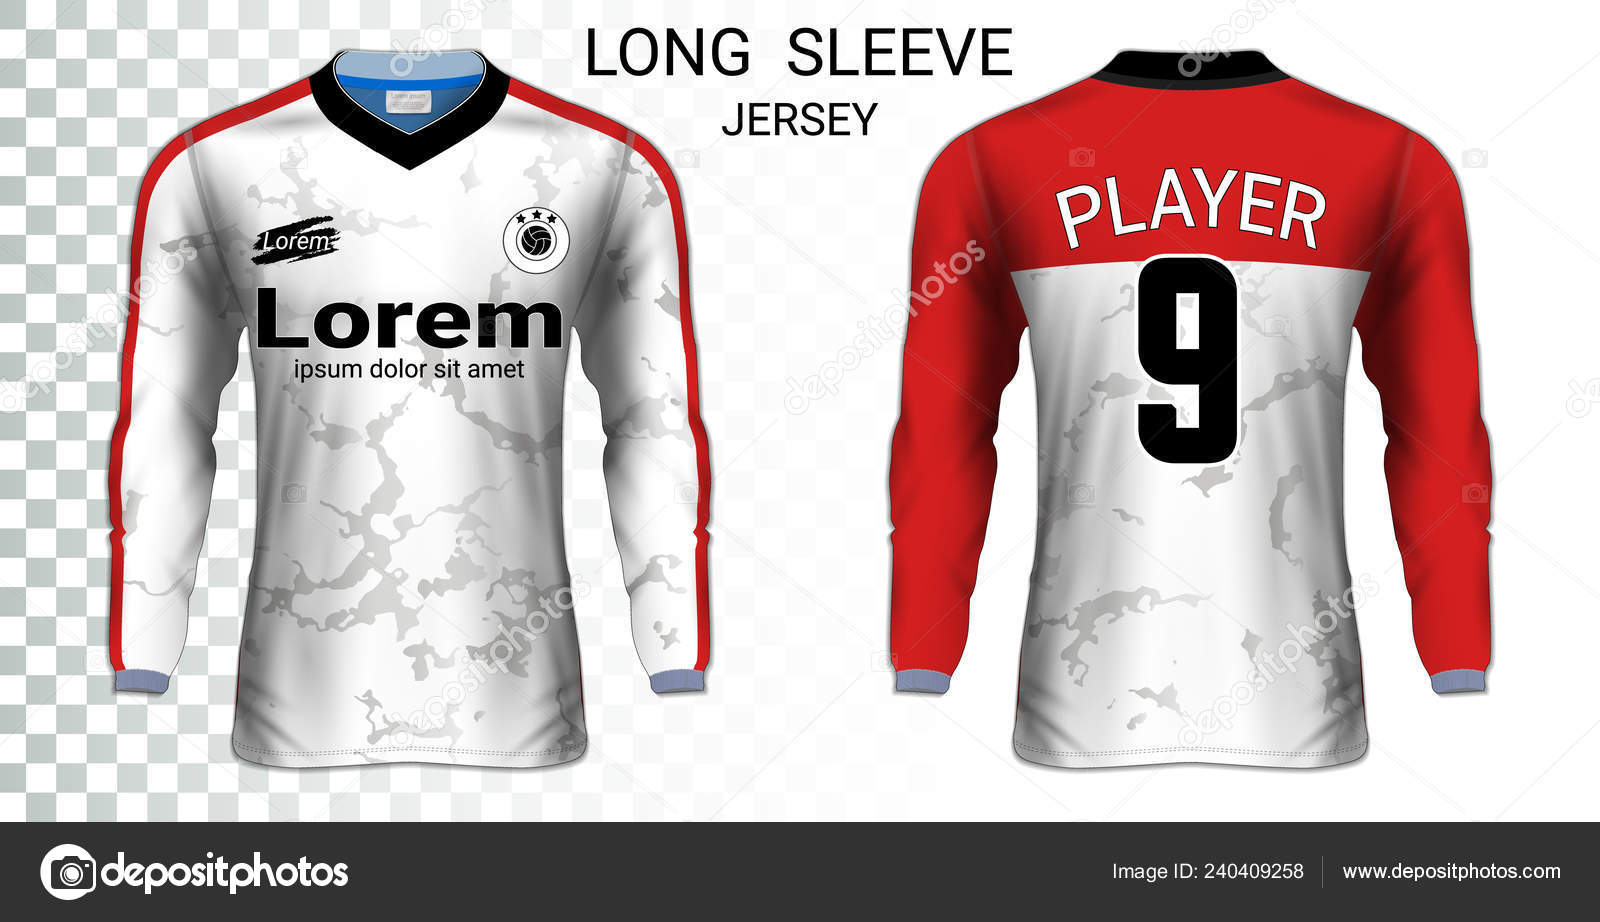 00434660b925 Μακρυμάνικη μπλούζα μπλούζες ποδοσφαίρου, T-Shirt αθλητισμού mockup  πρότυπο, ρεαλιστική γραφιστική για στολή ποδοσφαίρου τερματοφύλακας,  Motocross, ...